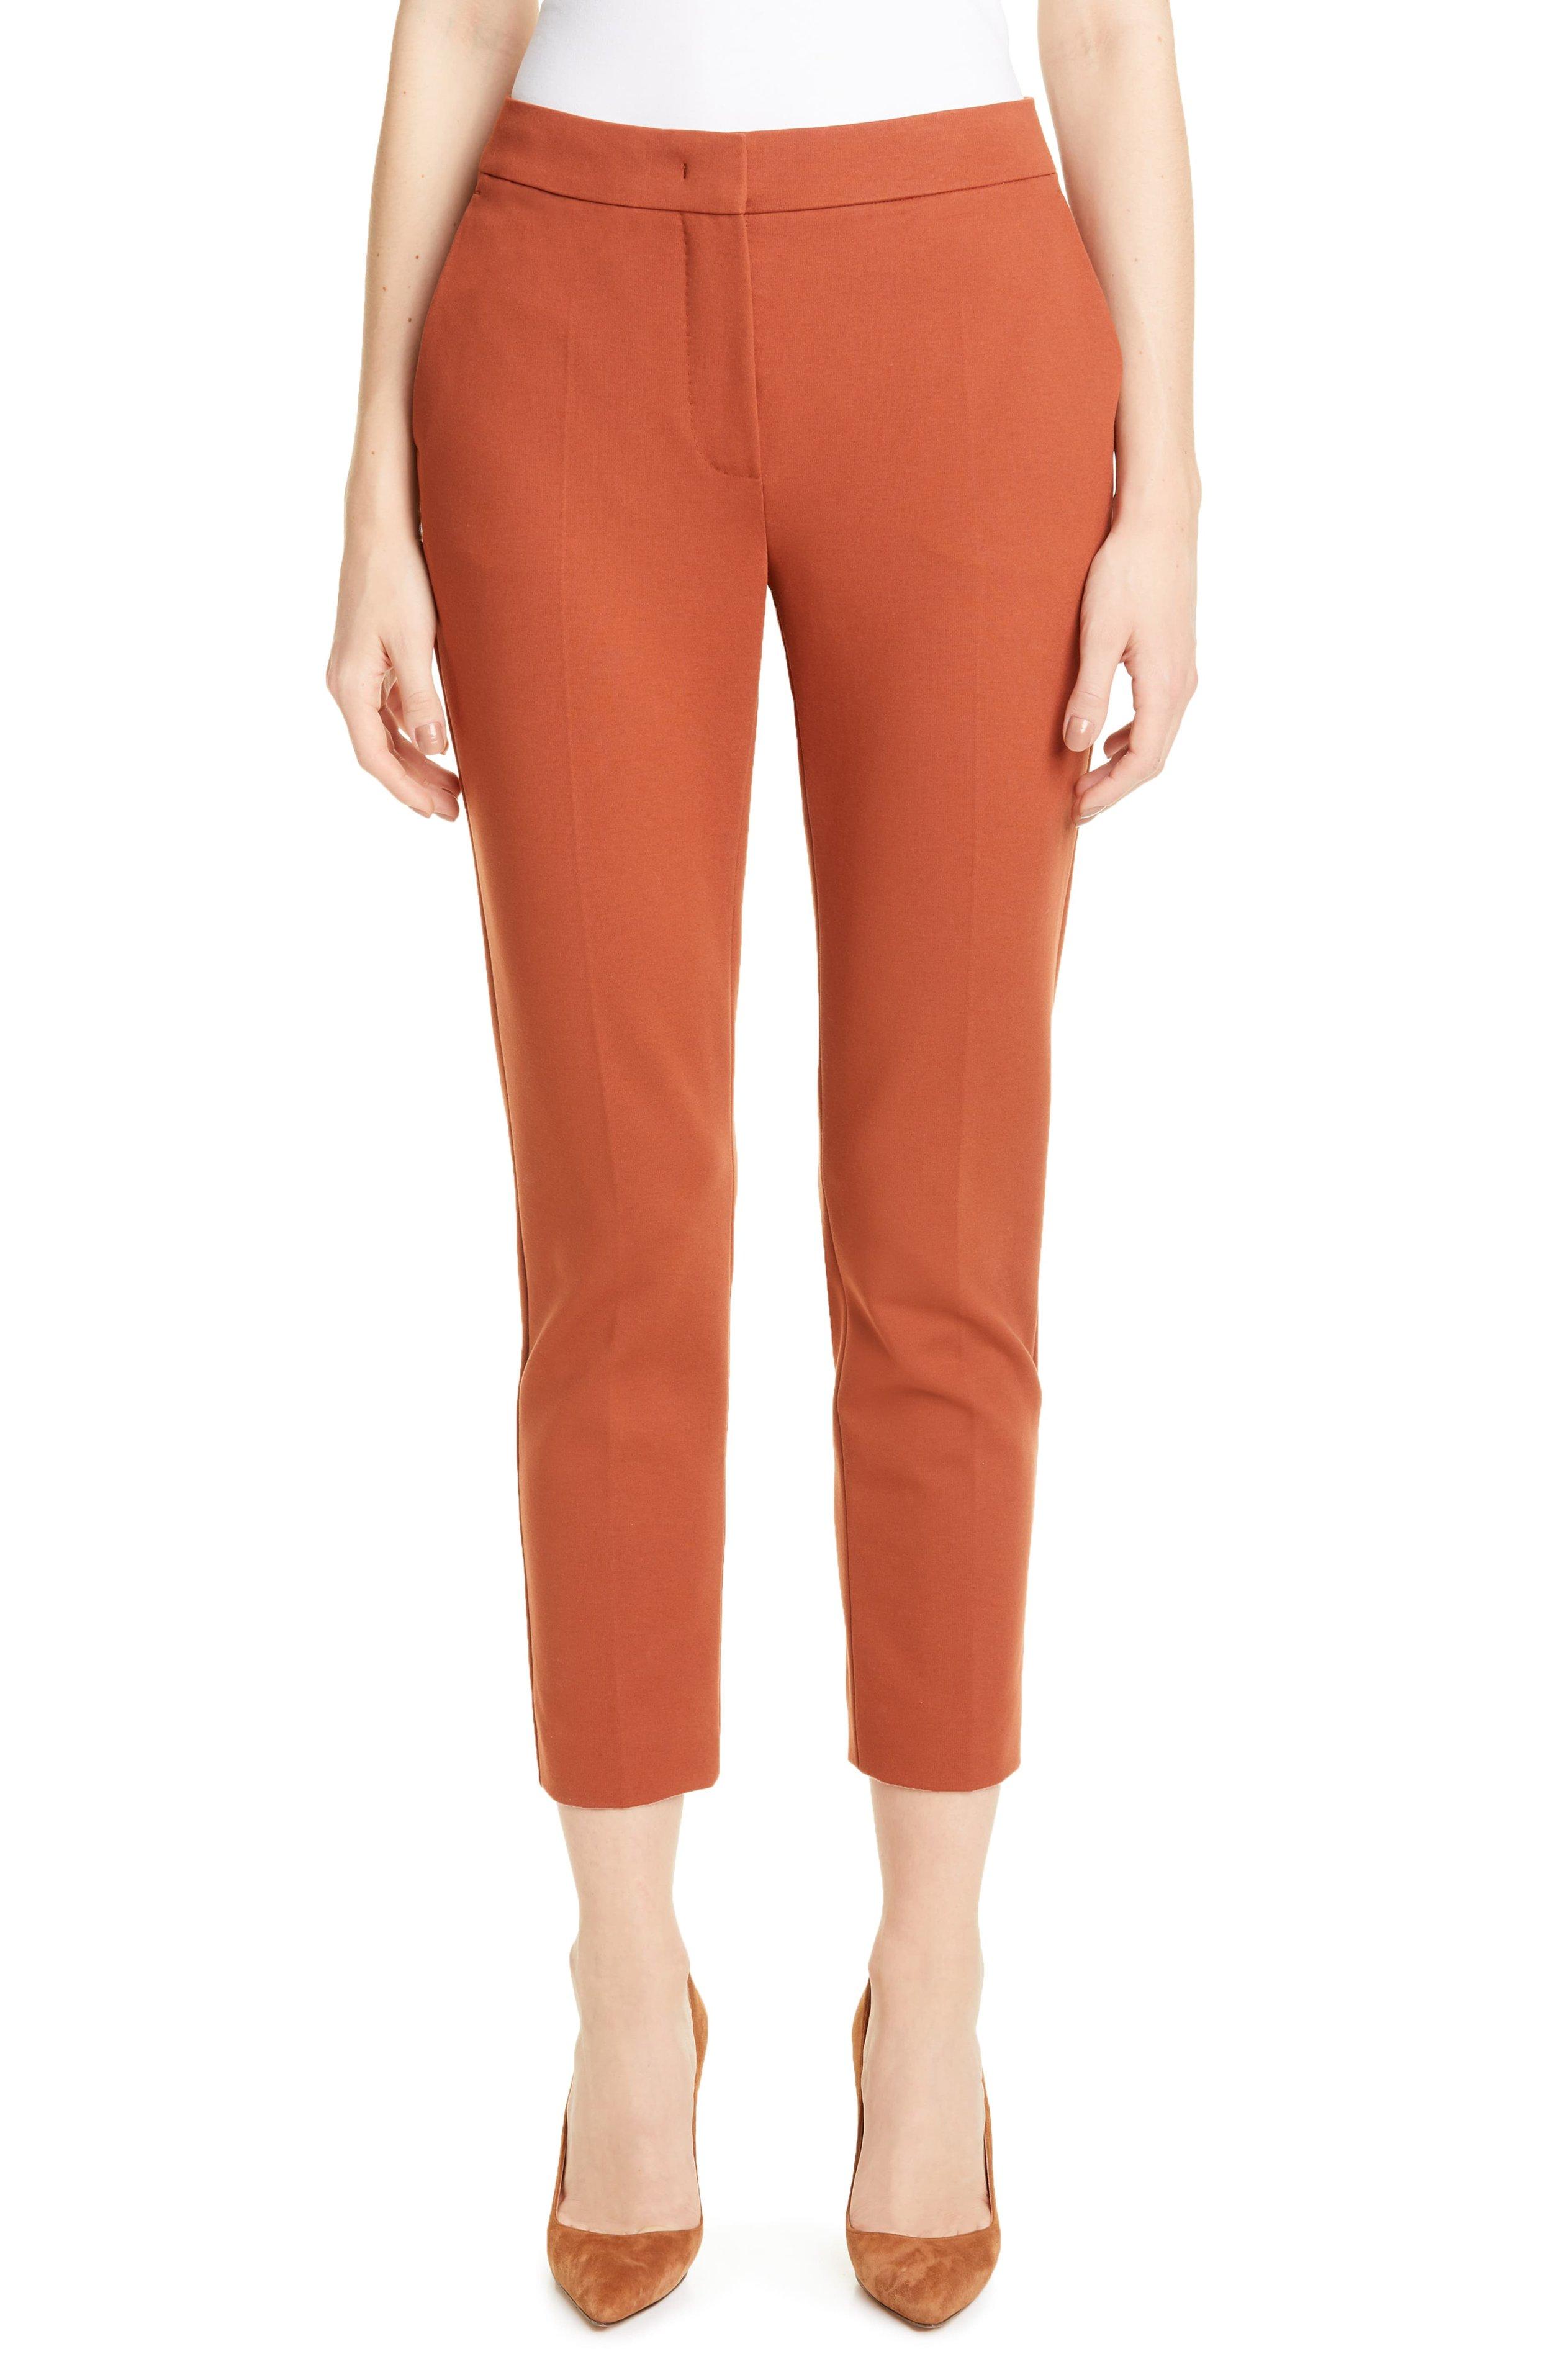 Pegno Slim Knit Crop Pants, $595, Nordstrom